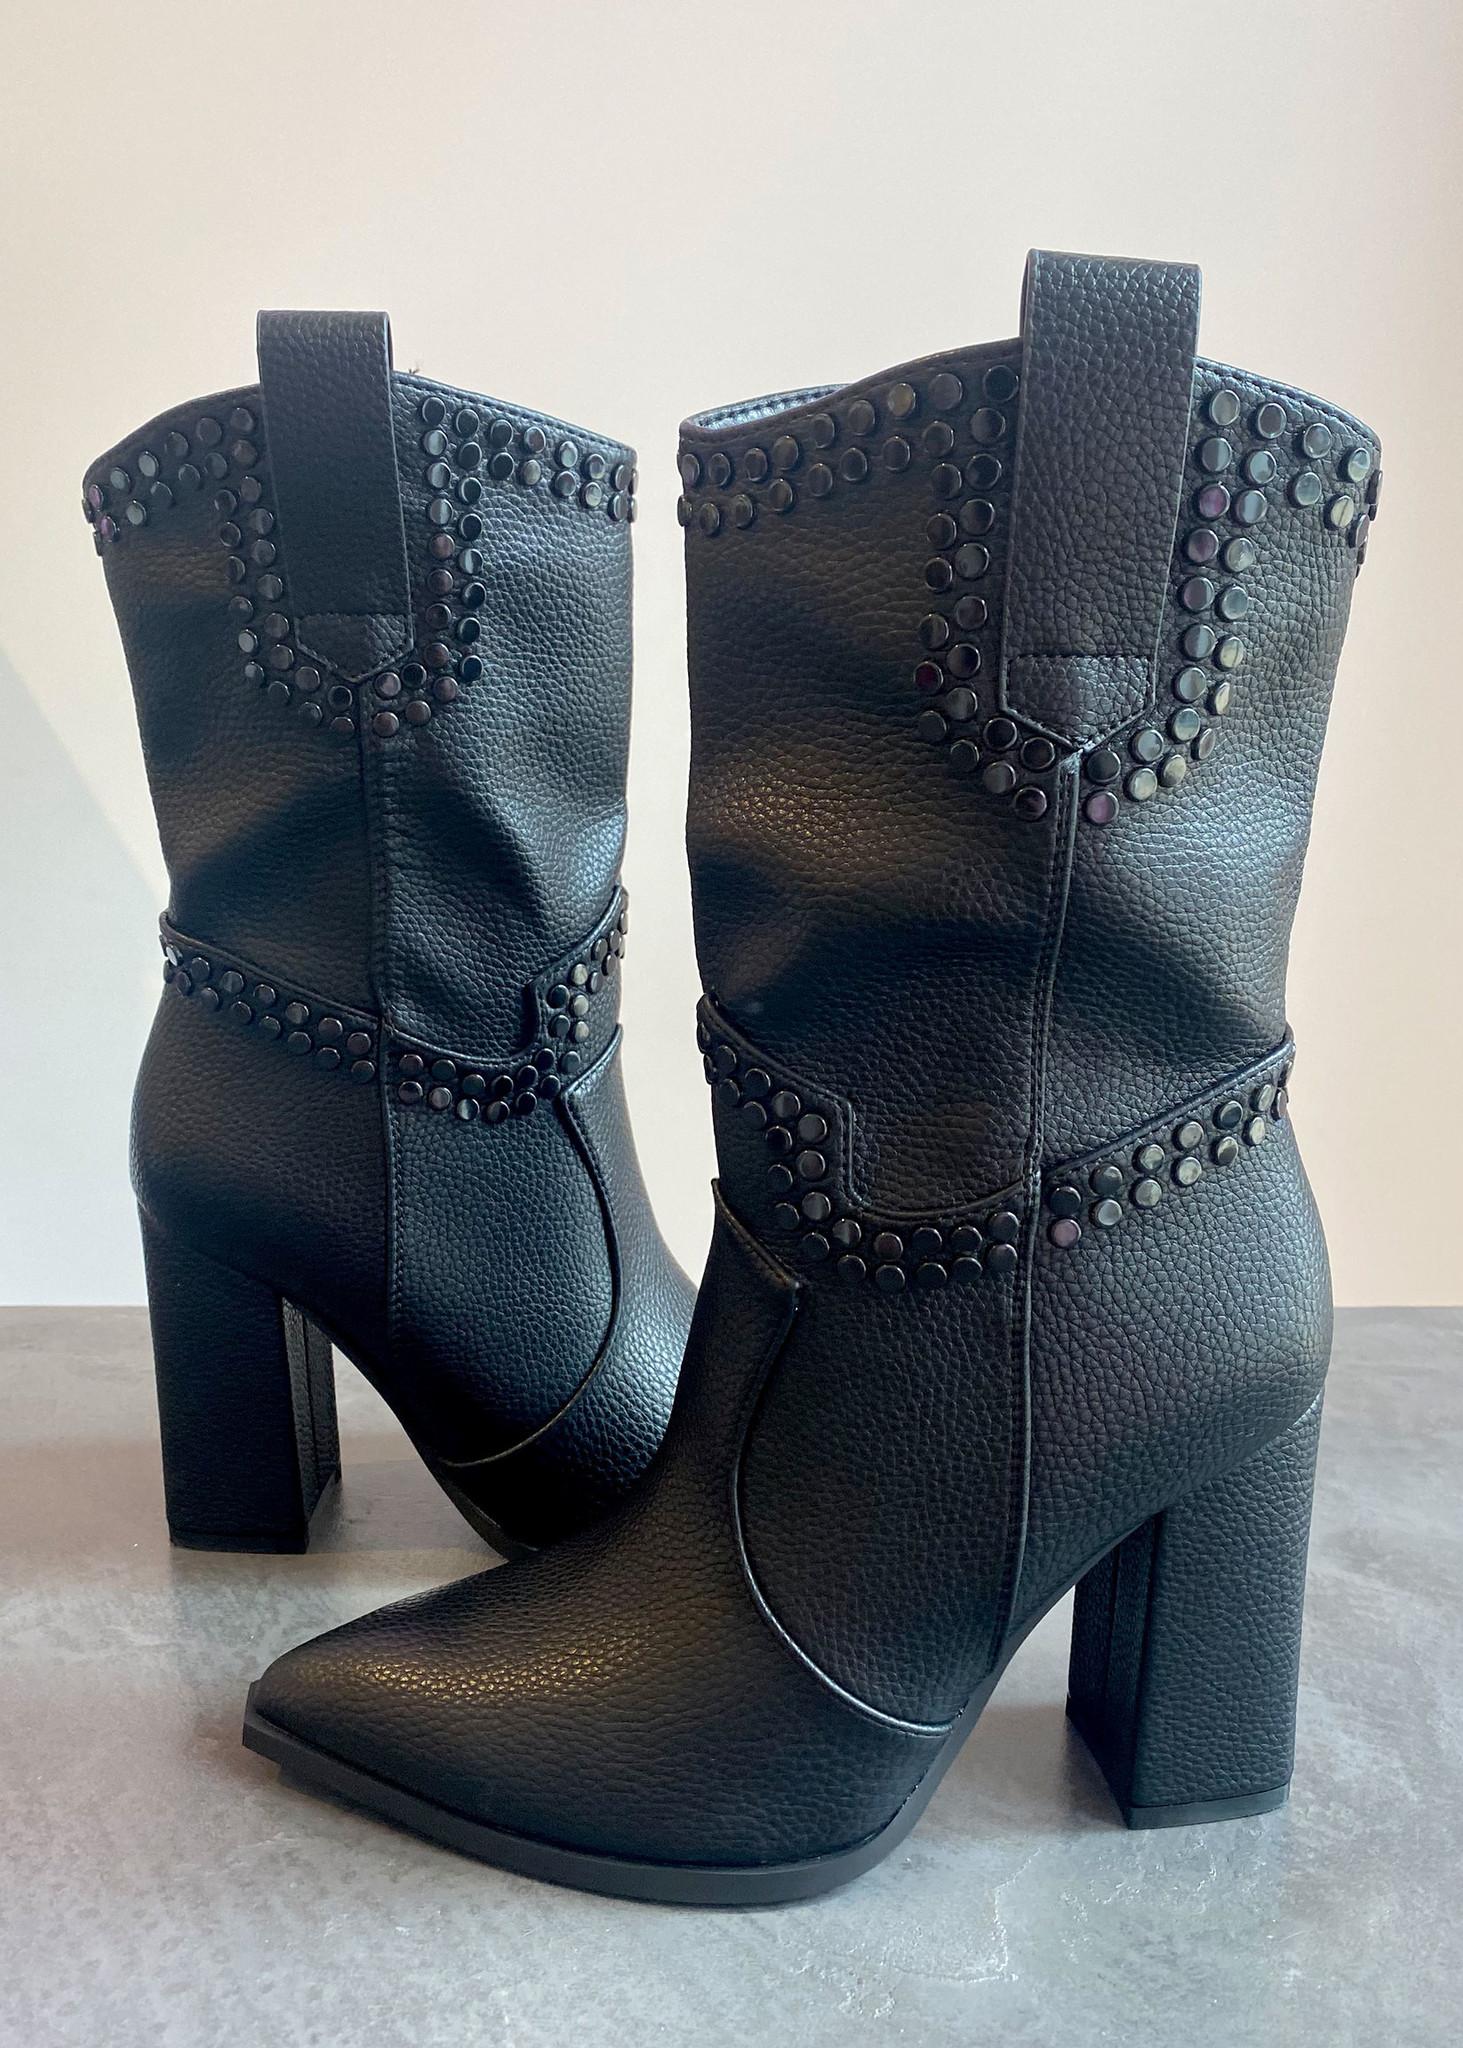 Xess Boots Black-1